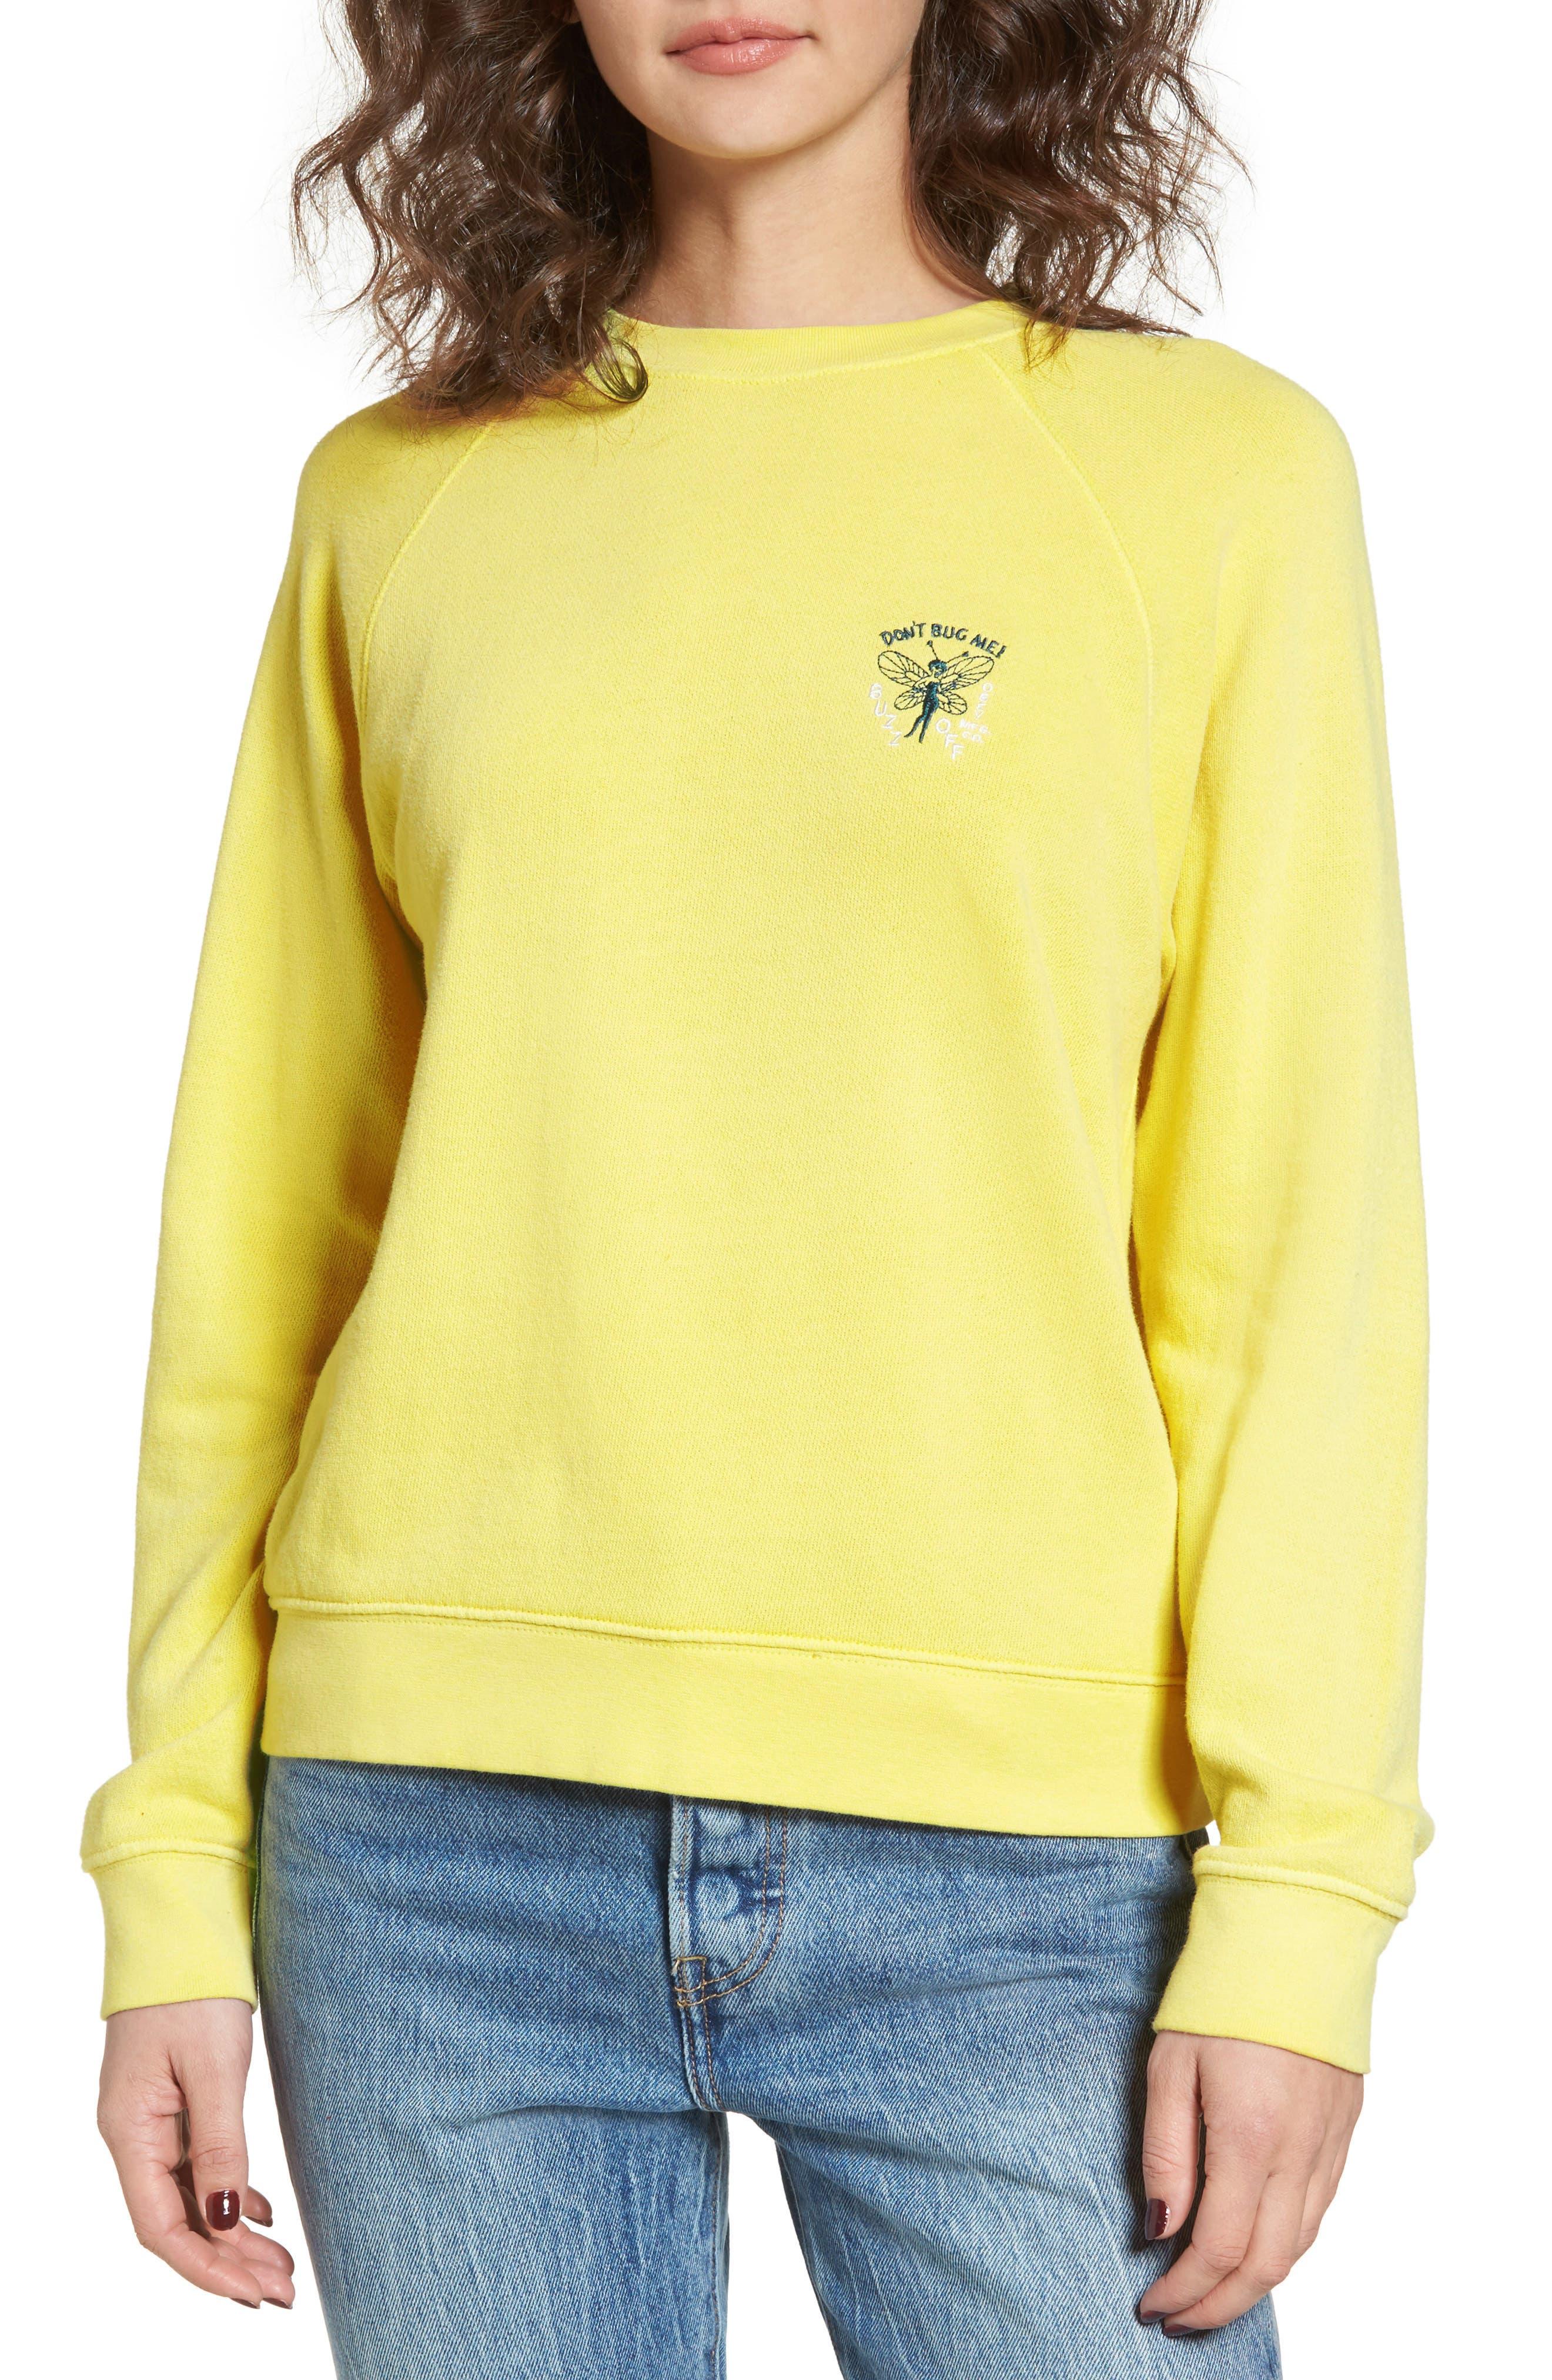 Portola Crew Sweatshirt,                         Main,                         color, 750